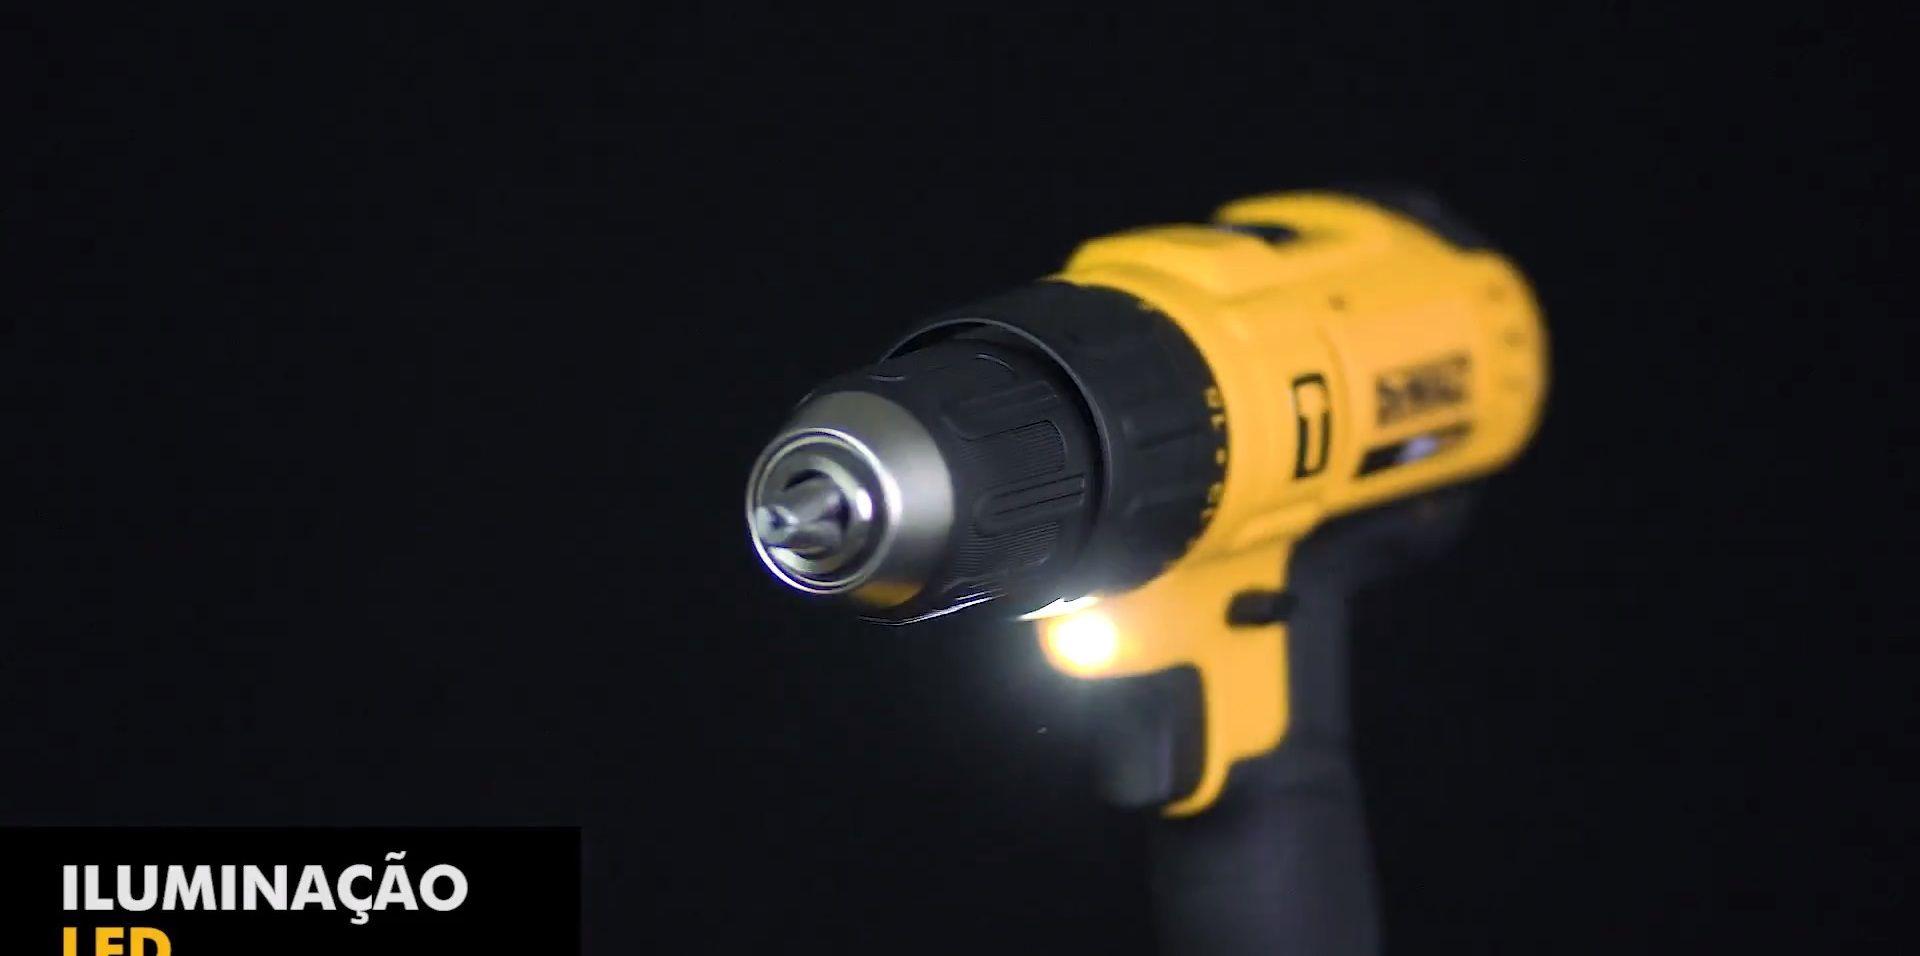 Furadeira Parafusadeira Impacto Profissional 13mm 20v c2 Baterias Dewalt DCD776C2-BR+Tesoura Mundial